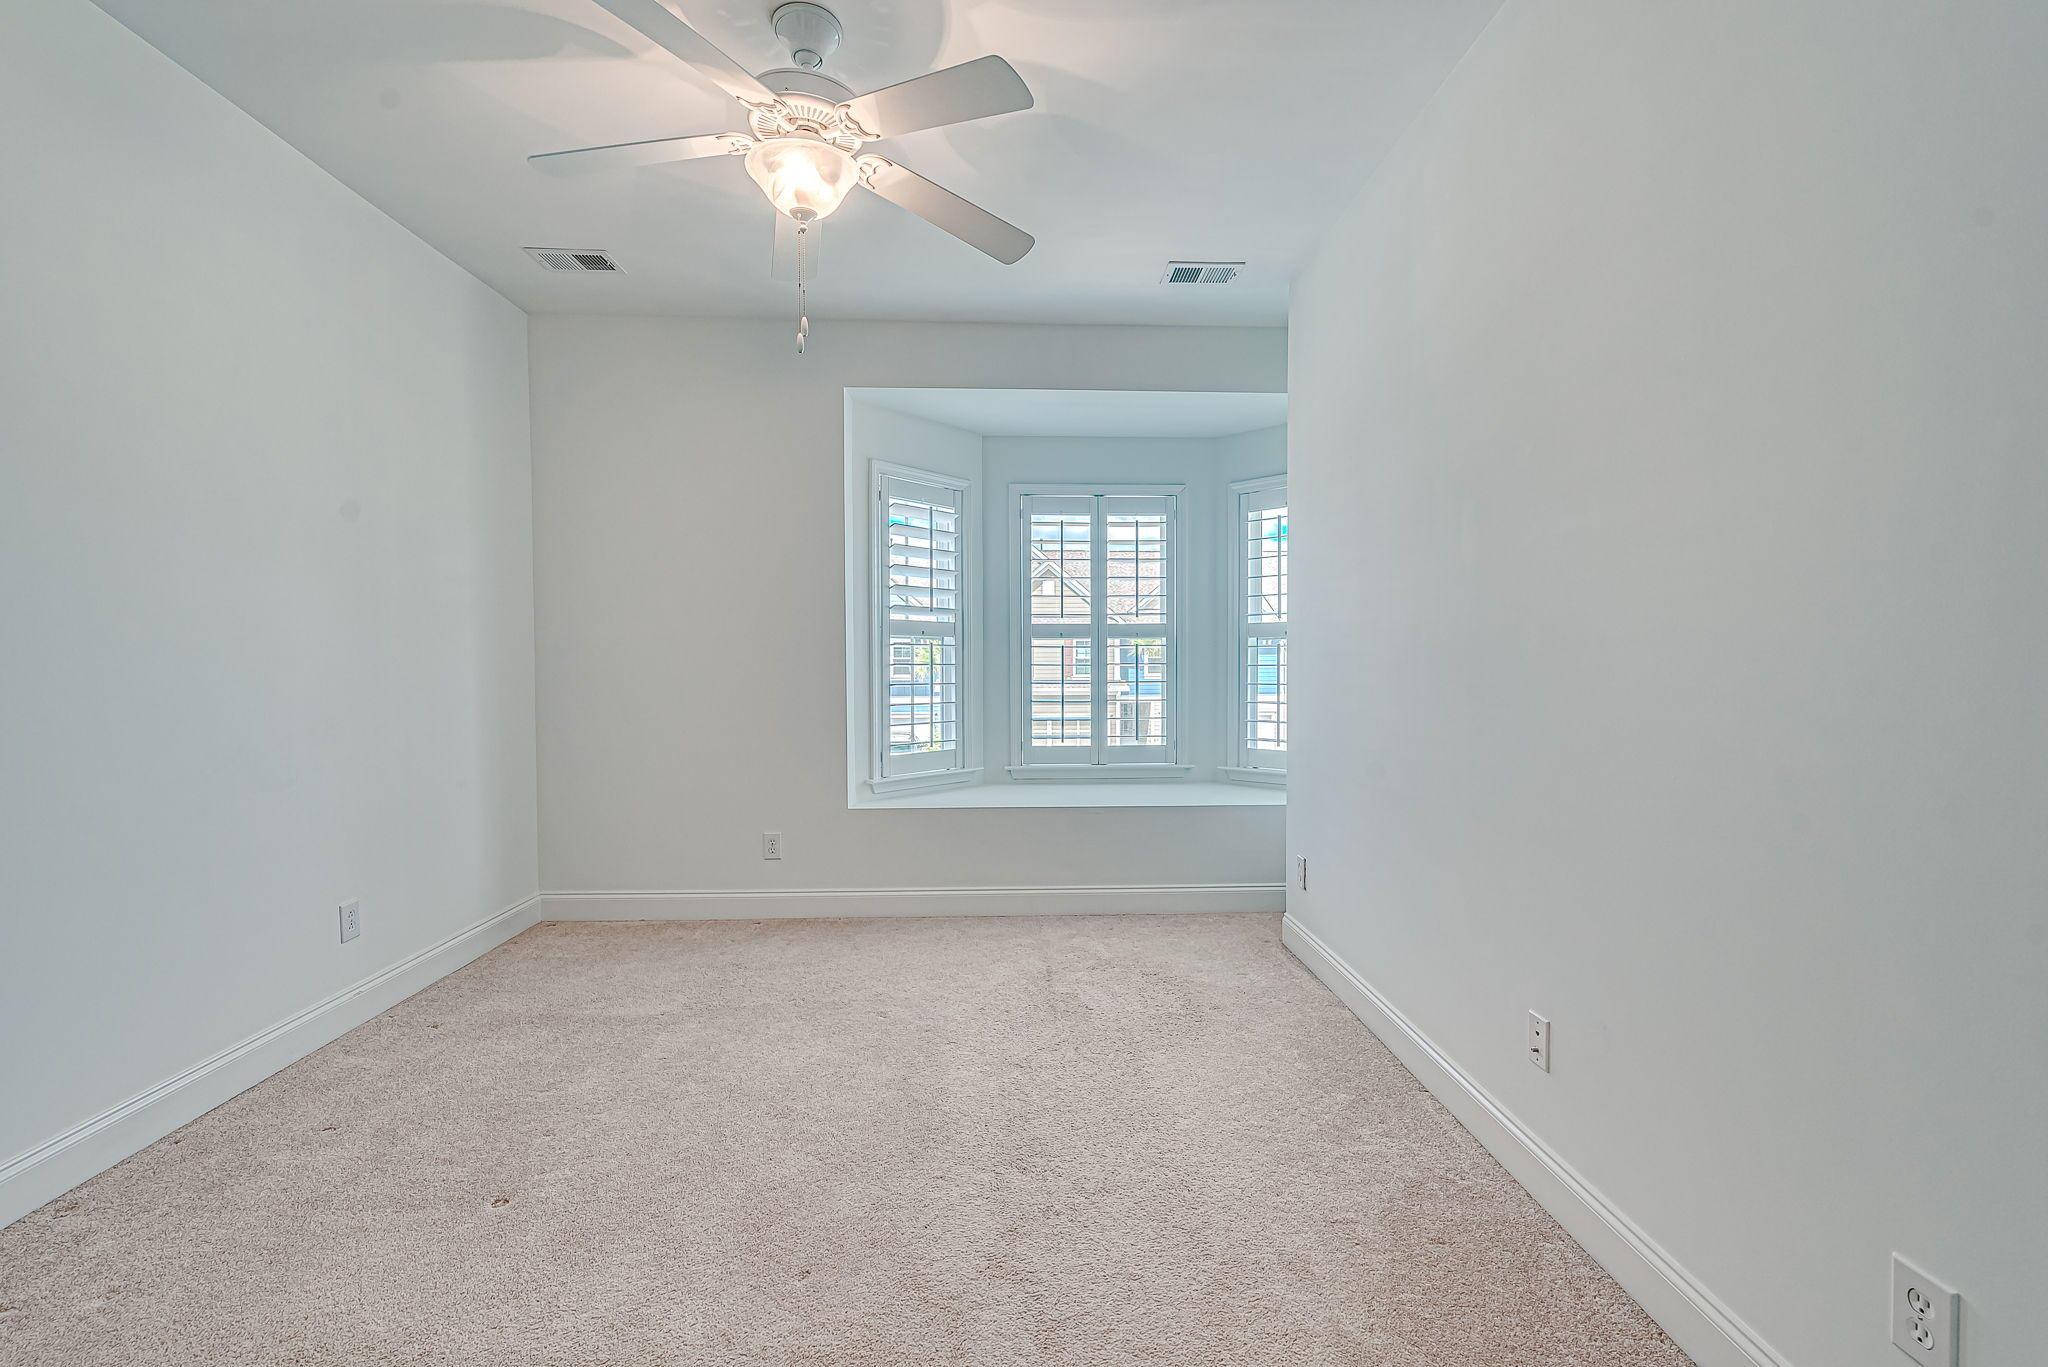 Dunes West Homes For Sale - 2476 Kings Gate, Mount Pleasant, SC - 37